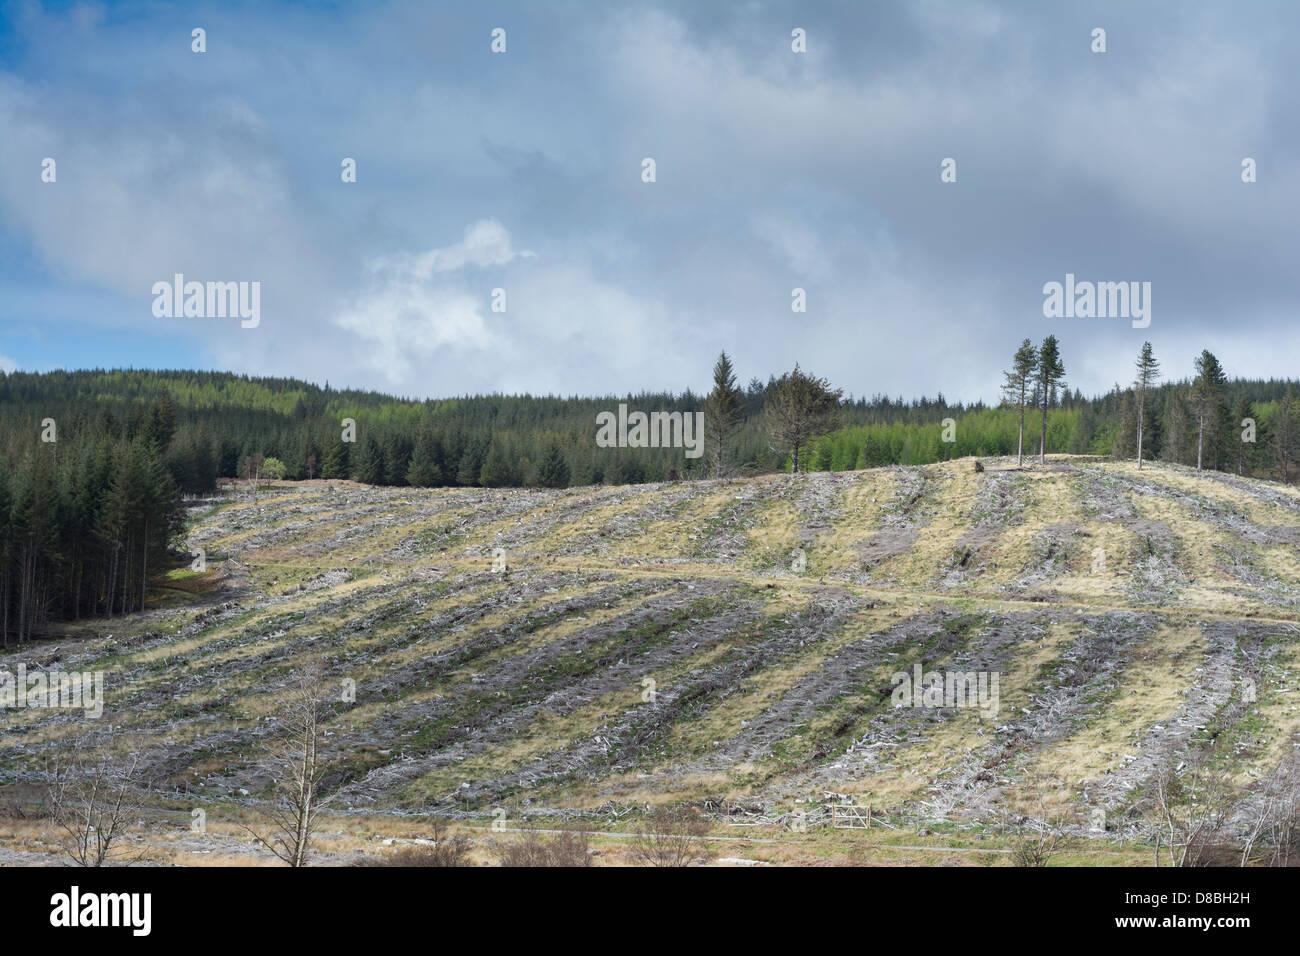 Coniferous forestry, Isle of Mull, Scotland - Stock Image